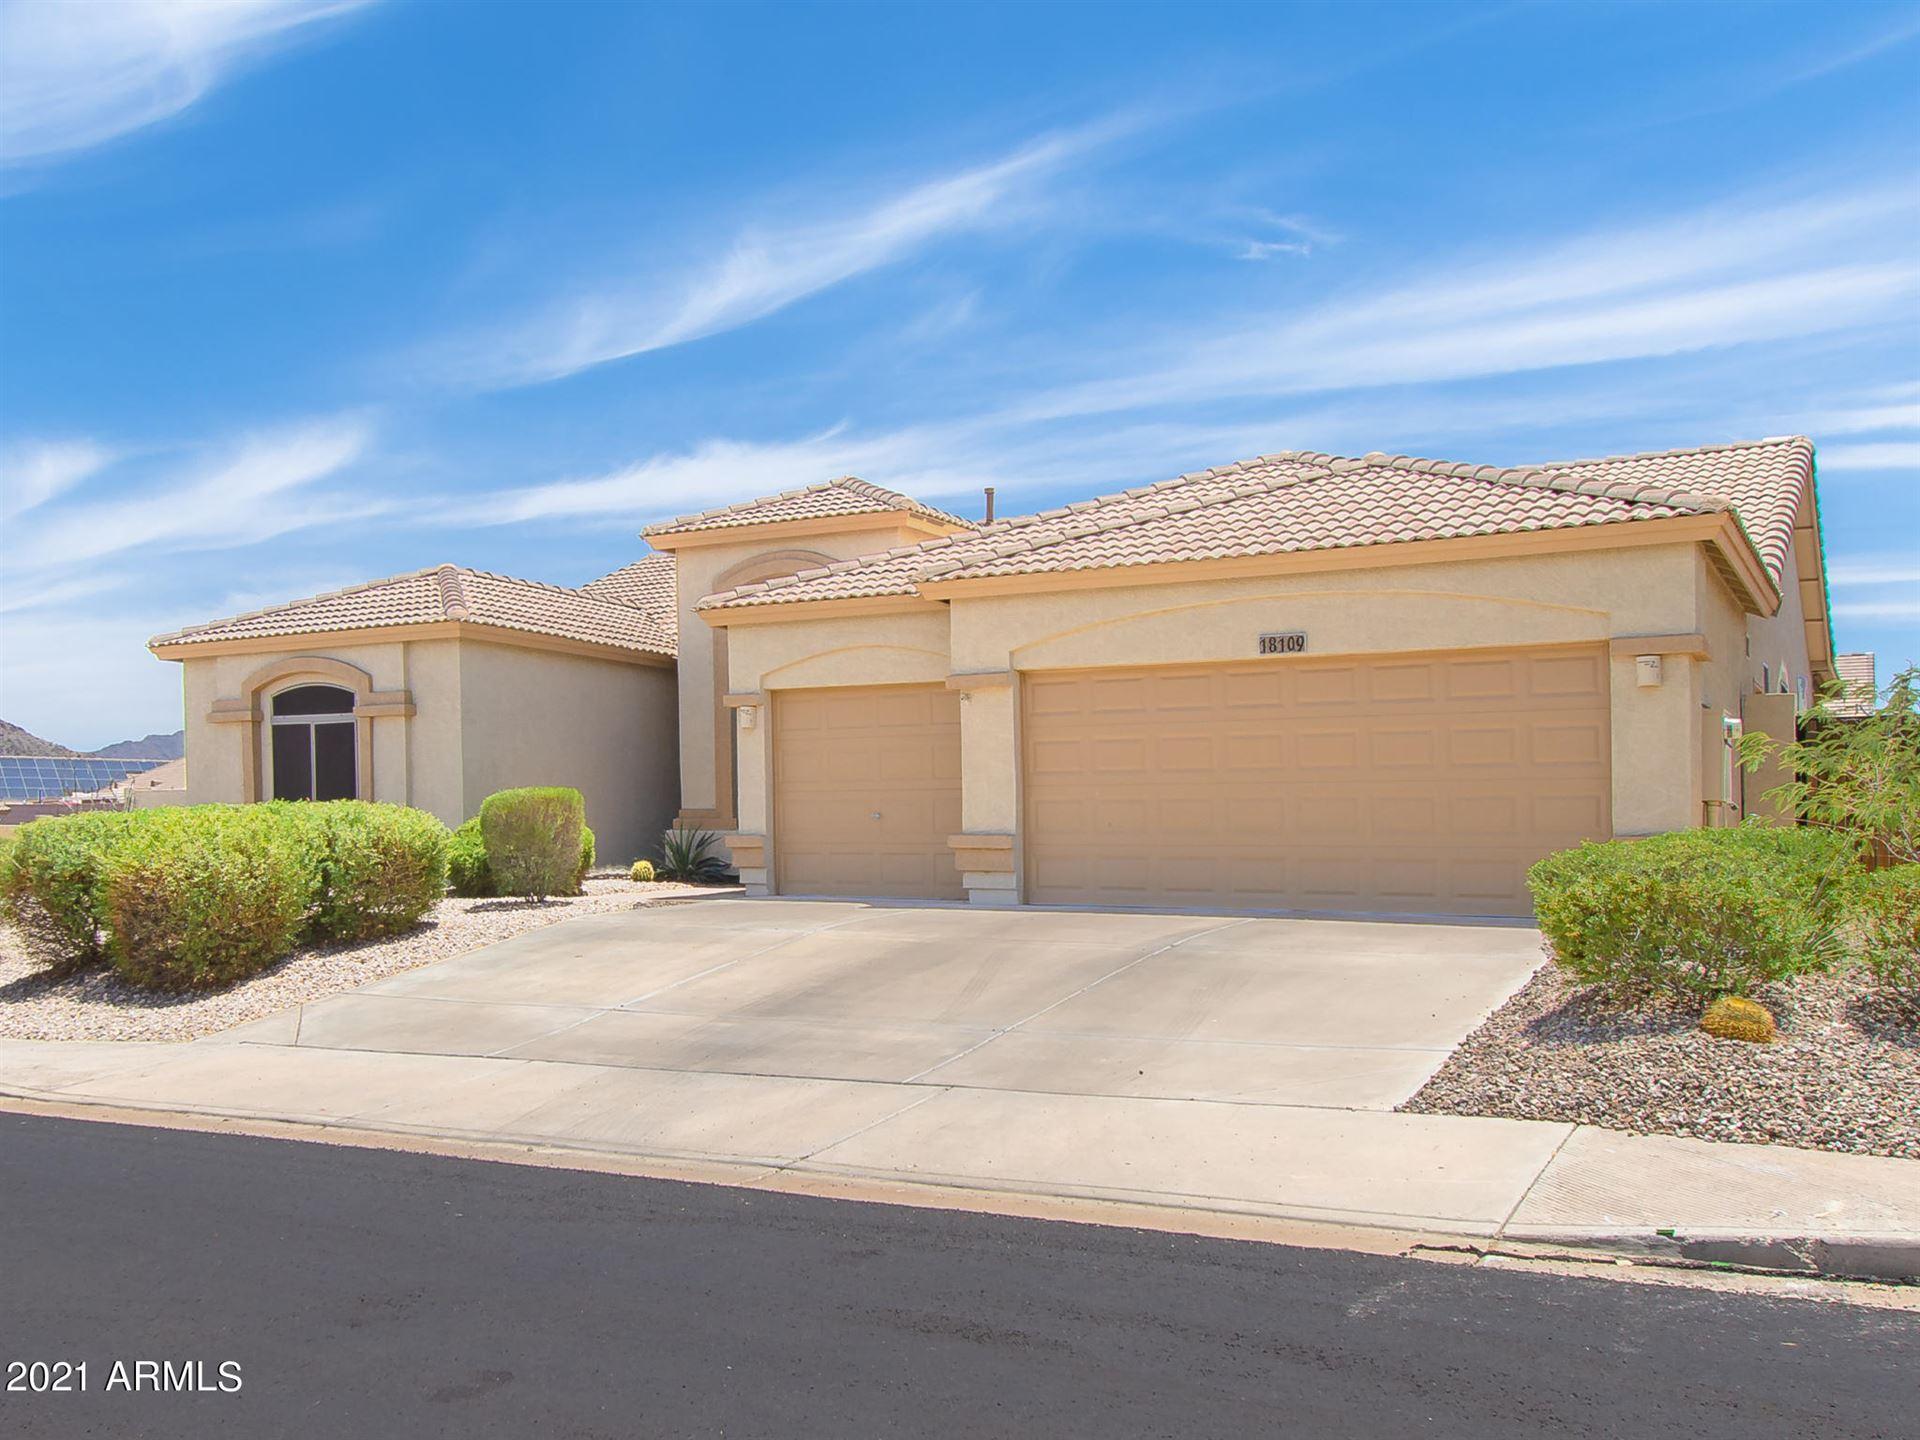 Photo of 18109 W SANTA ALBERTA Lane, Goodyear, AZ 85338 (MLS # 6247258)